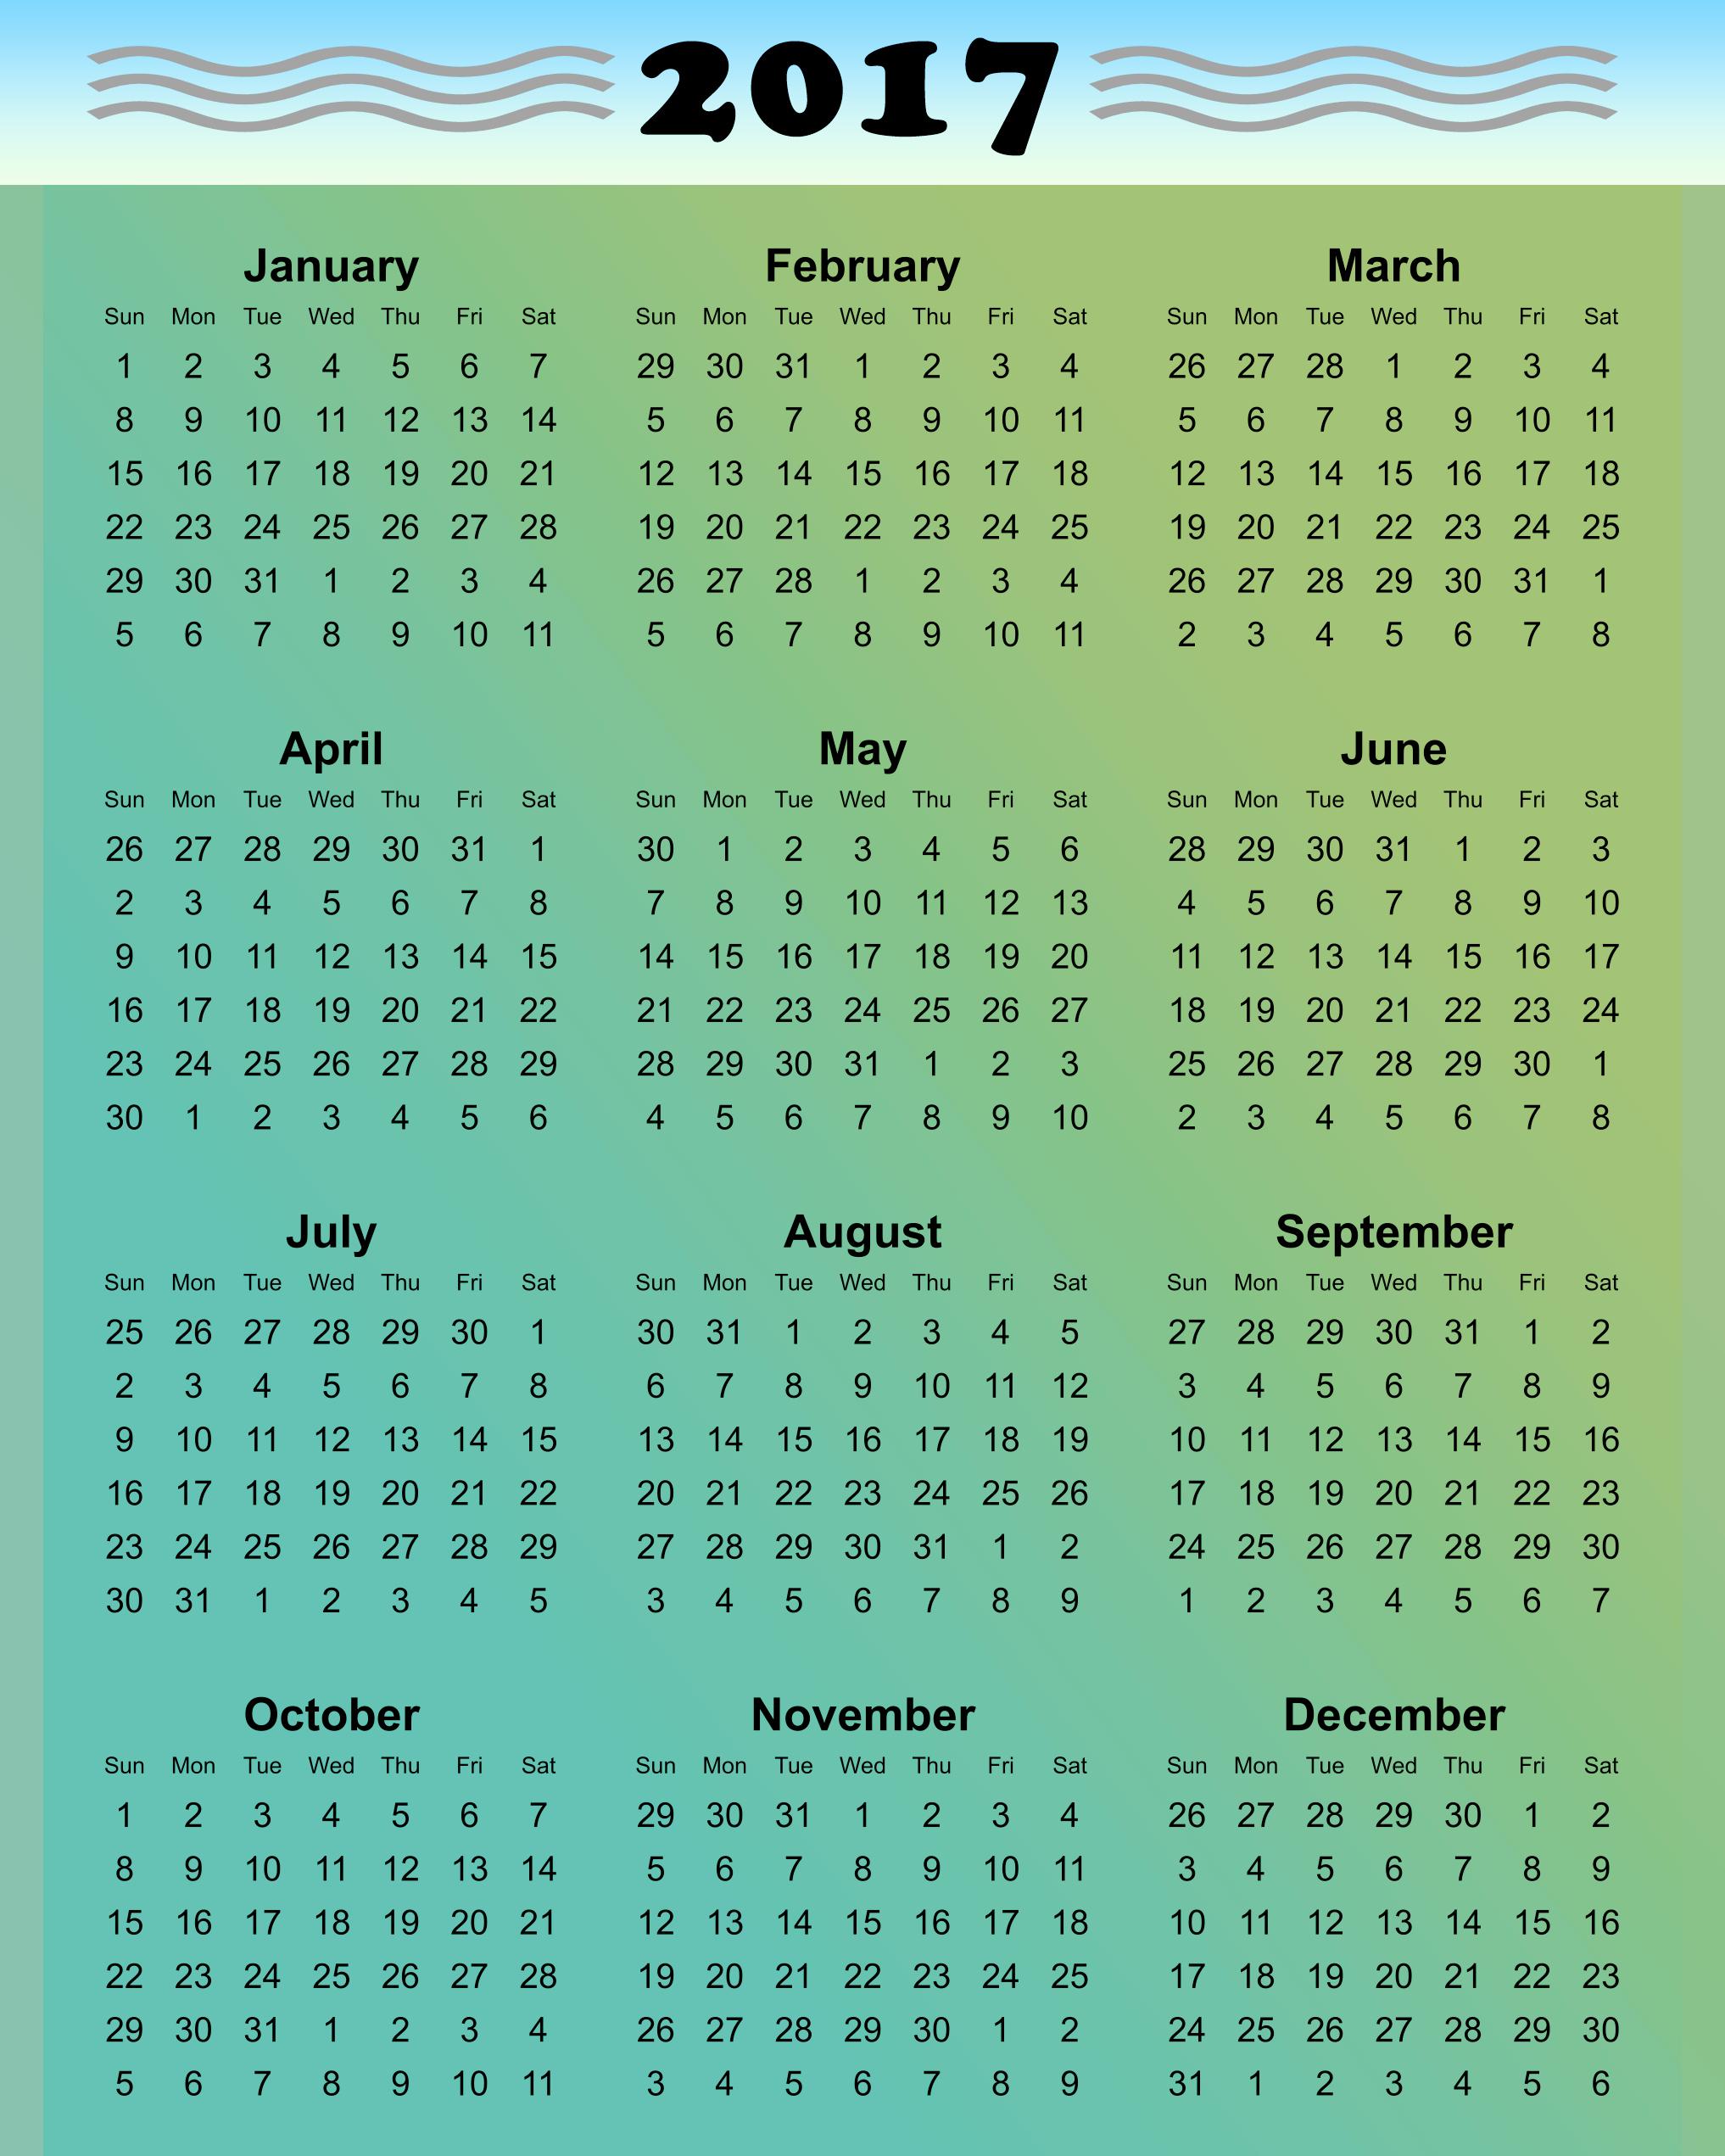 Free Download Of 2017 Calendar Best Of Printable 2017 Calendars